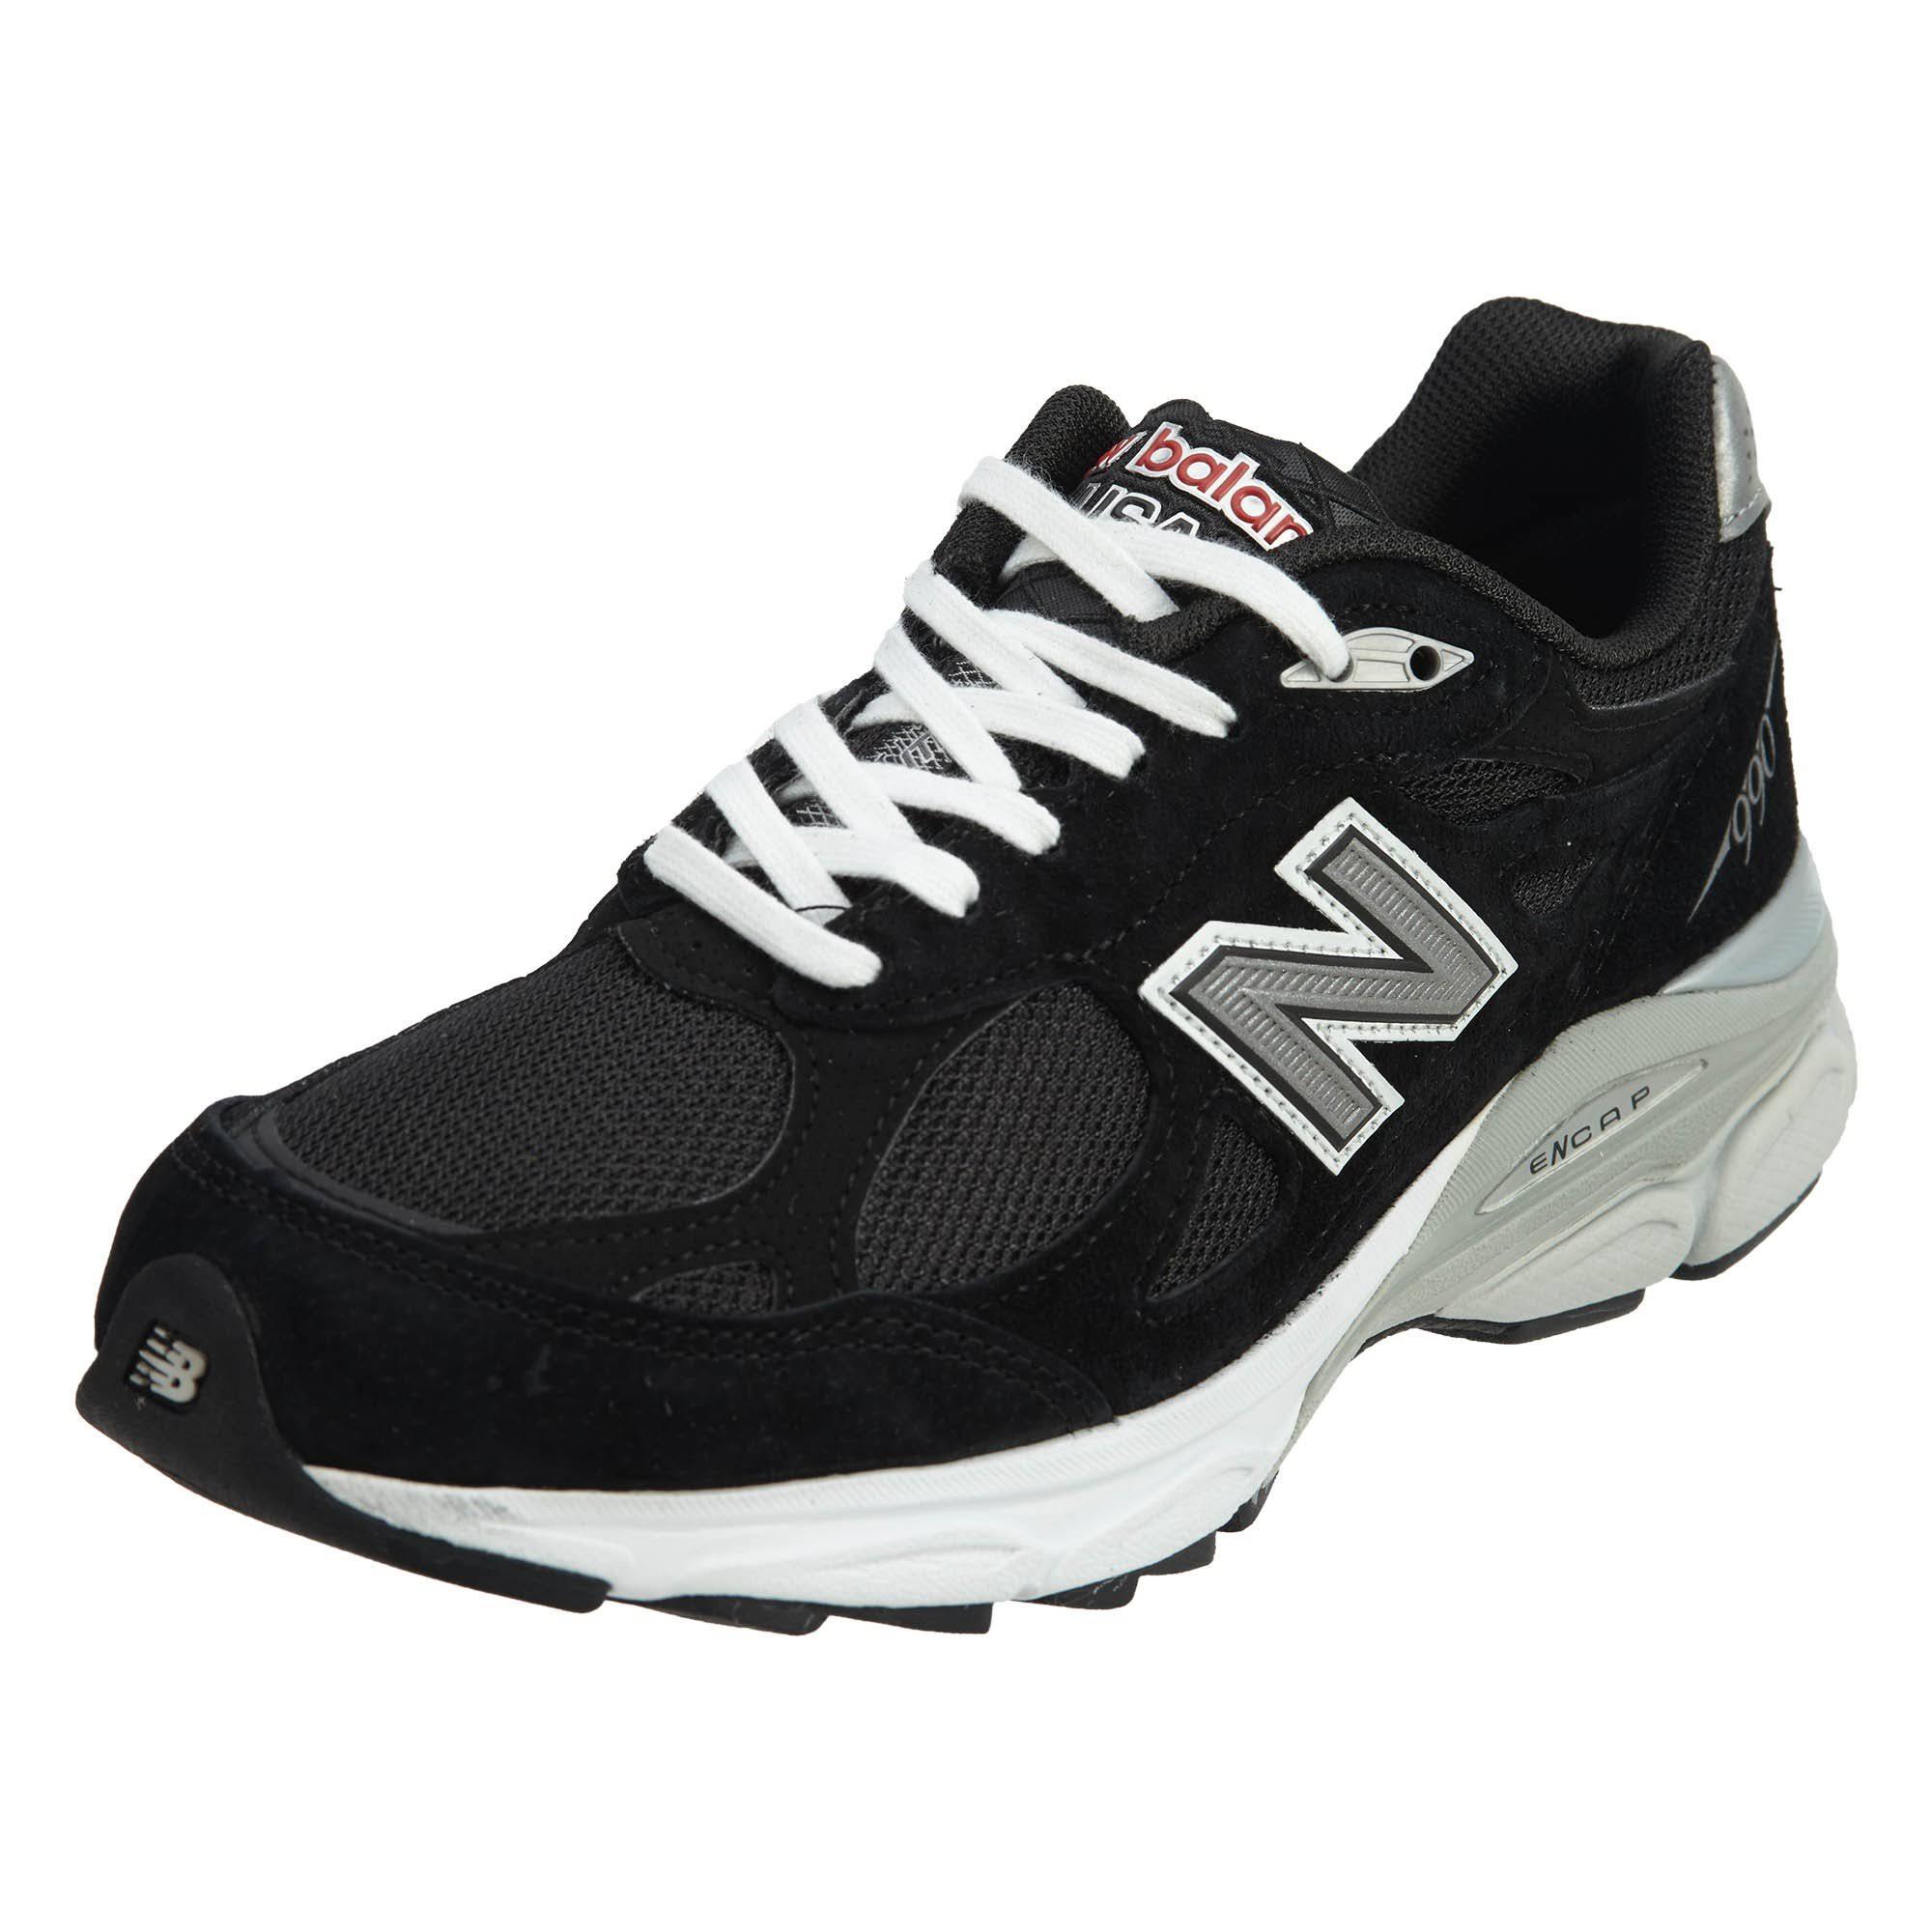 Negras Mujer Balance D V3 W990bk3 990 Zapatillas New Para 5 nfqzYW57g